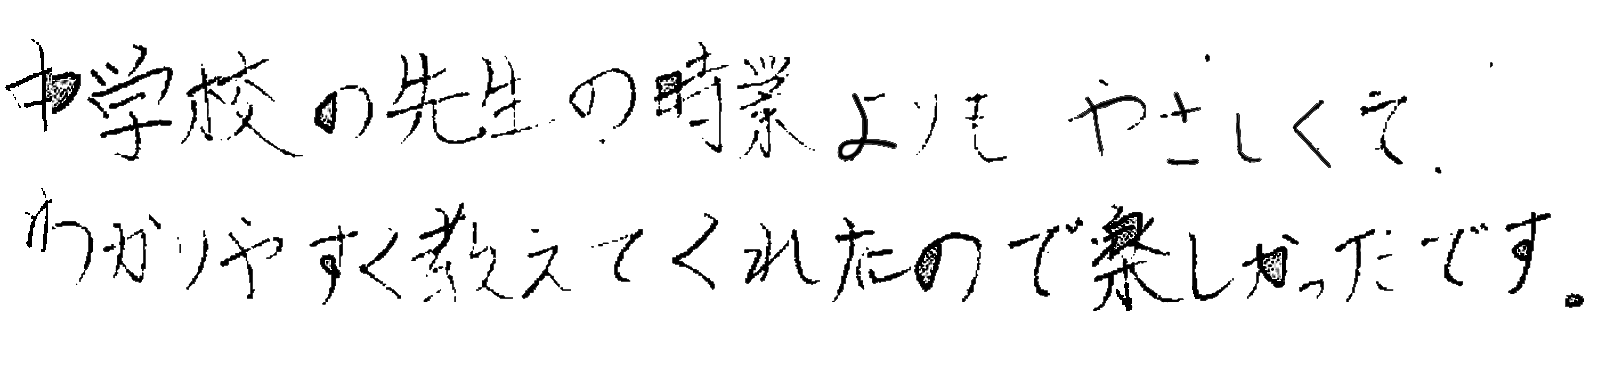 S君(あわら市)からの口コミ